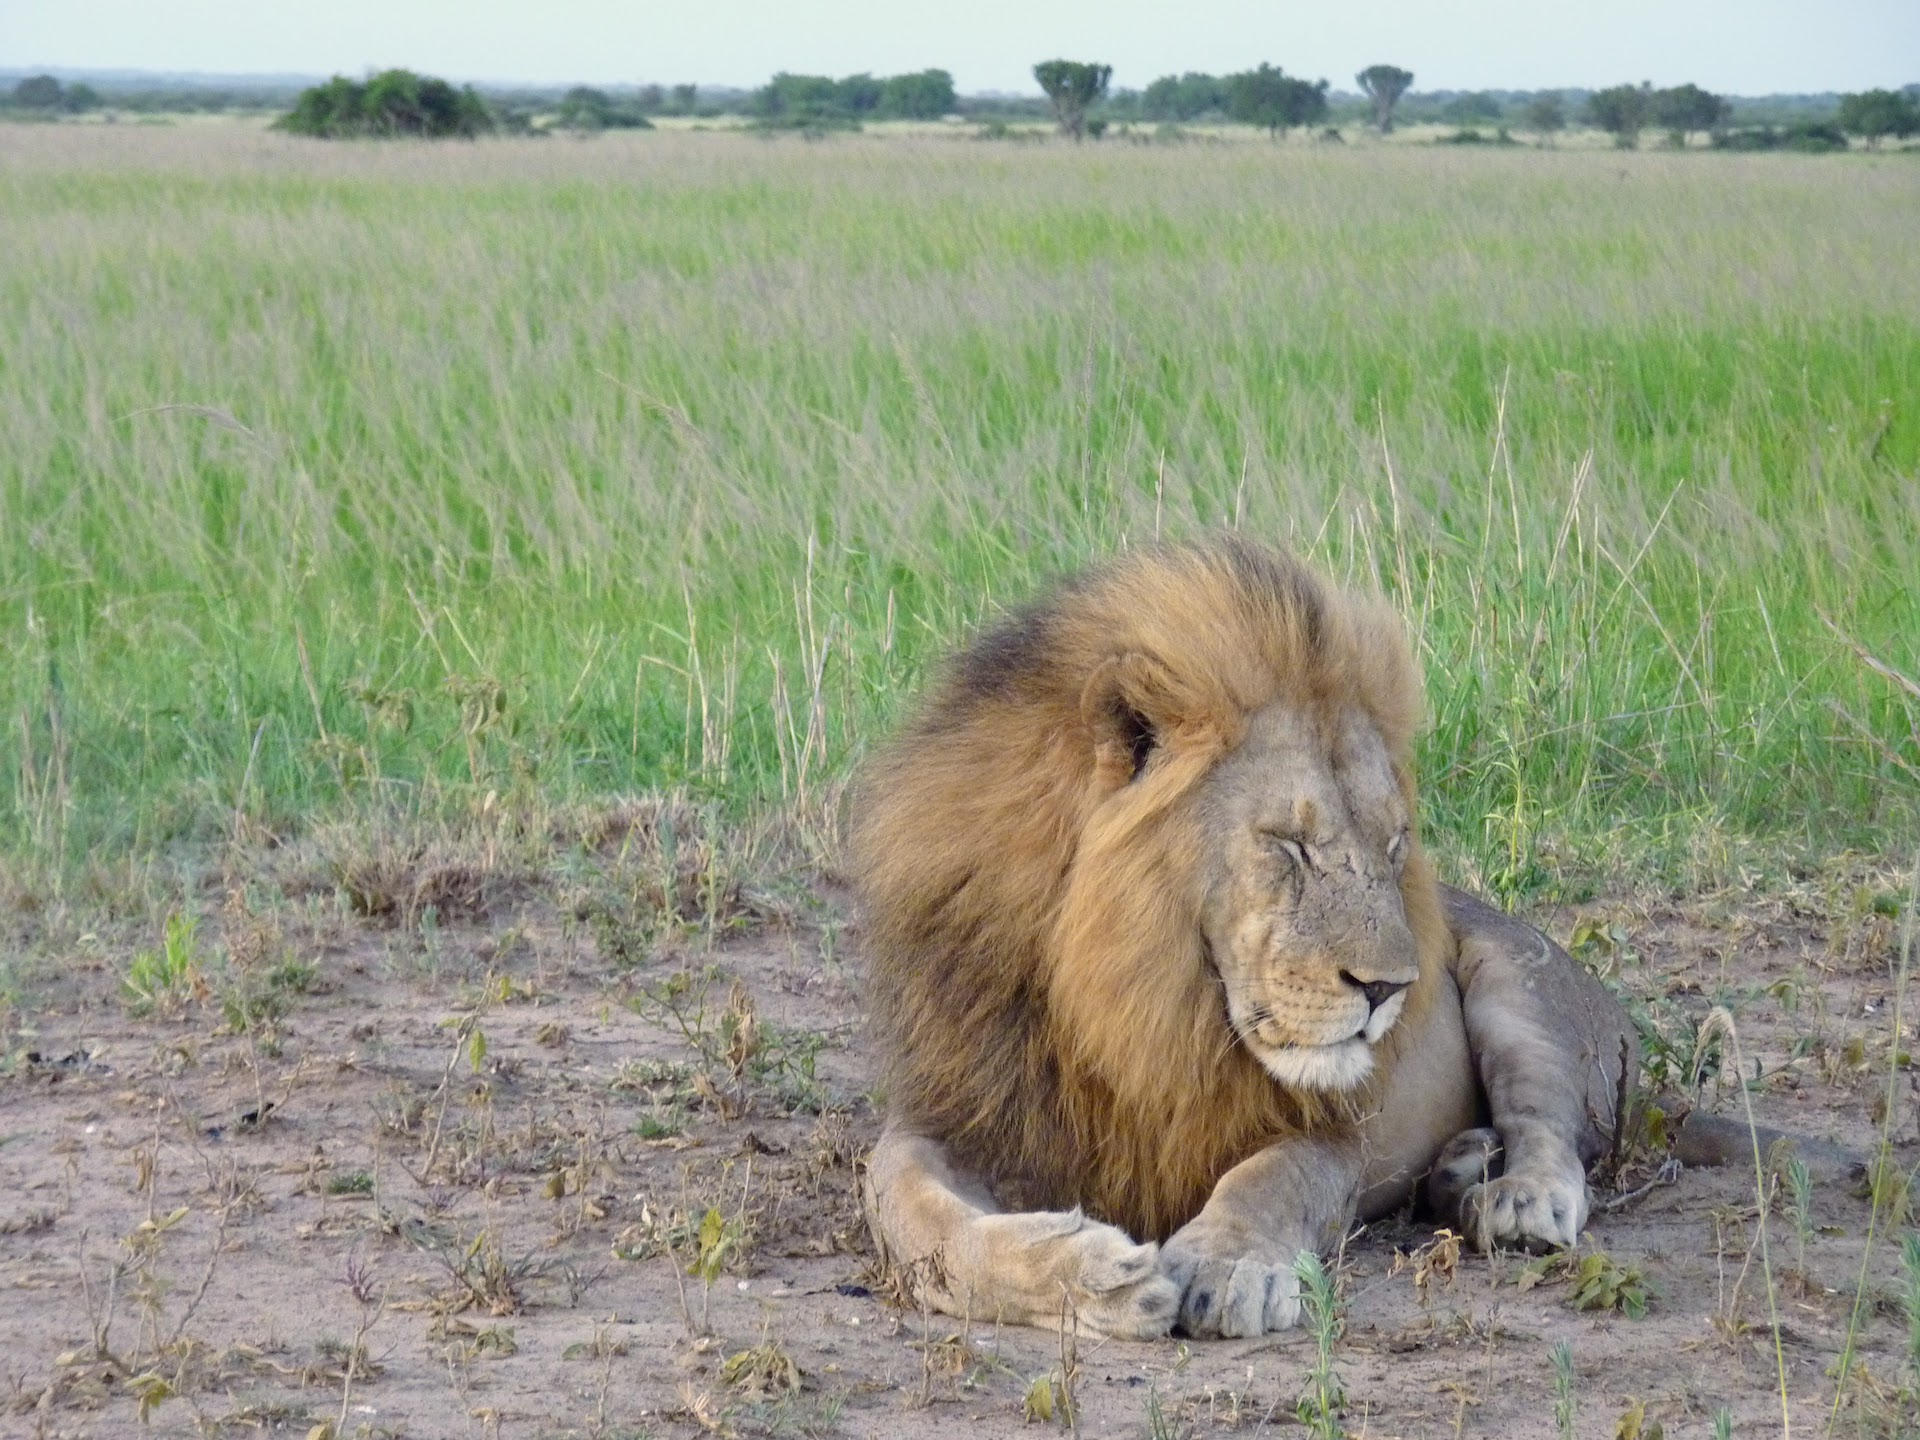 Kenya safari - lion